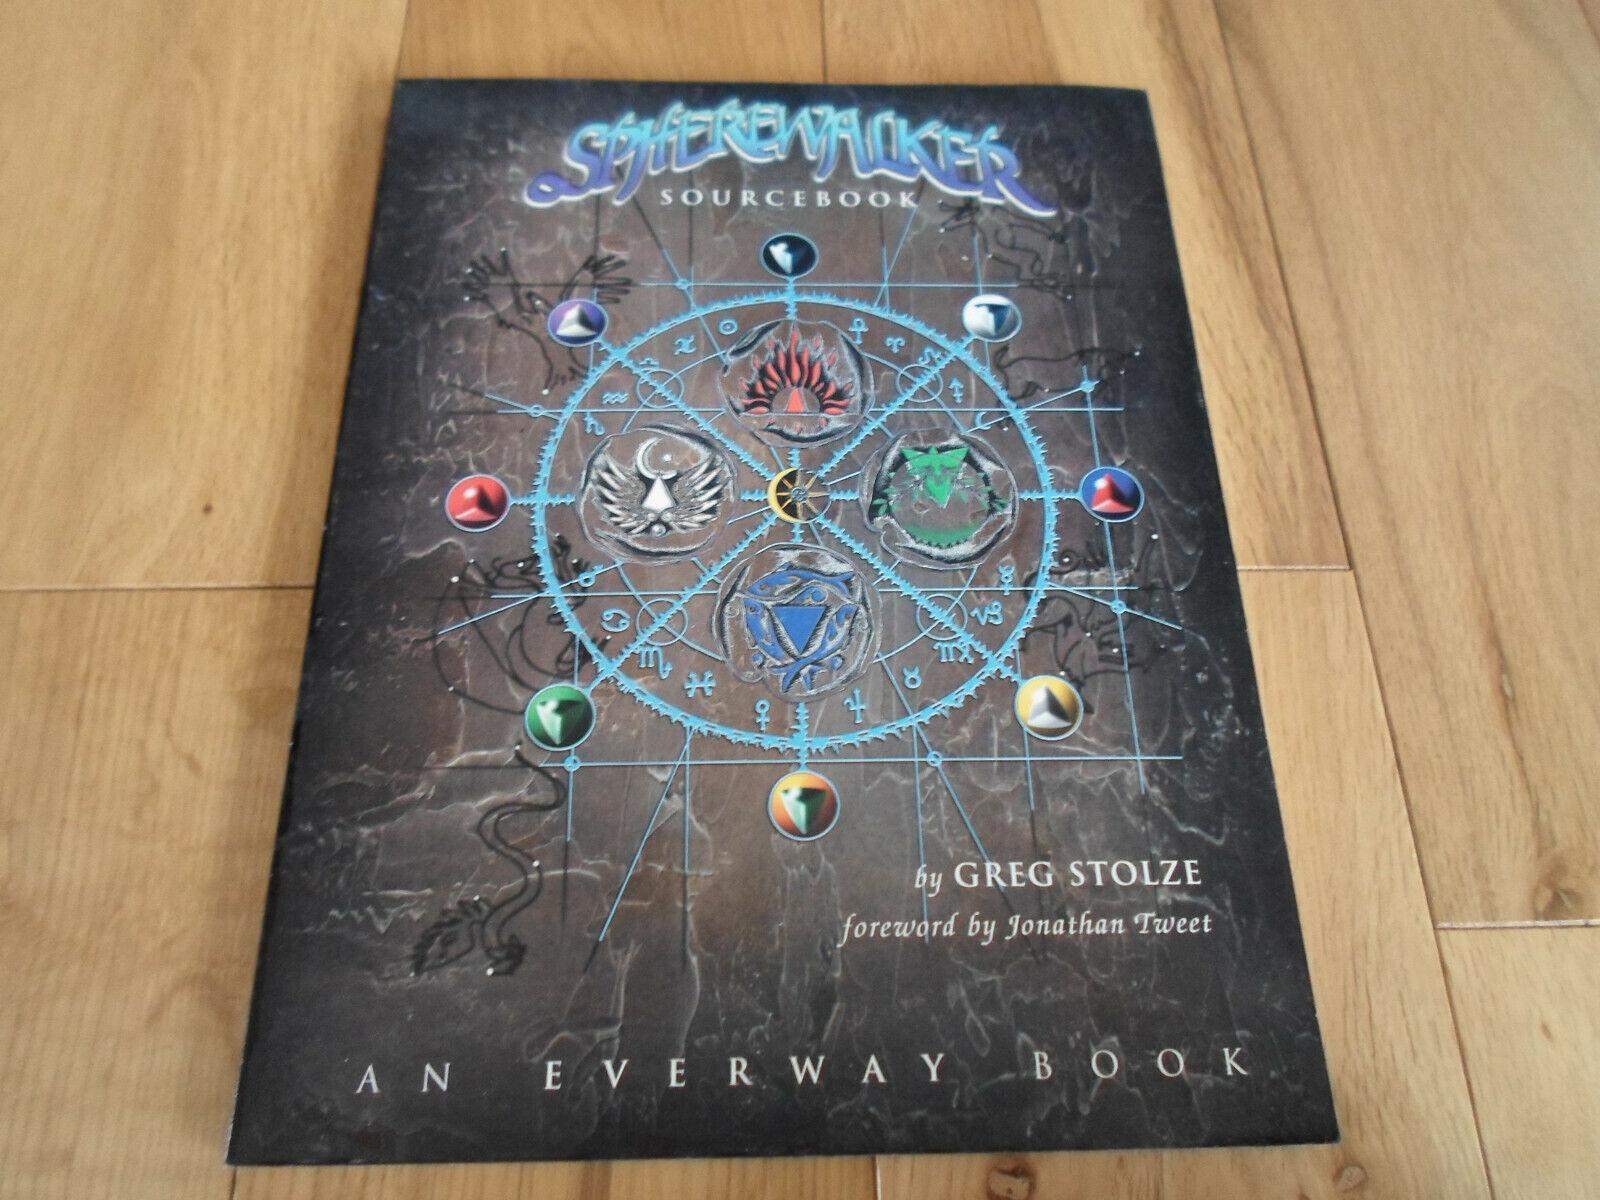 Ultra Raro everway spherewalker Sourcebook (casi Nuevo)